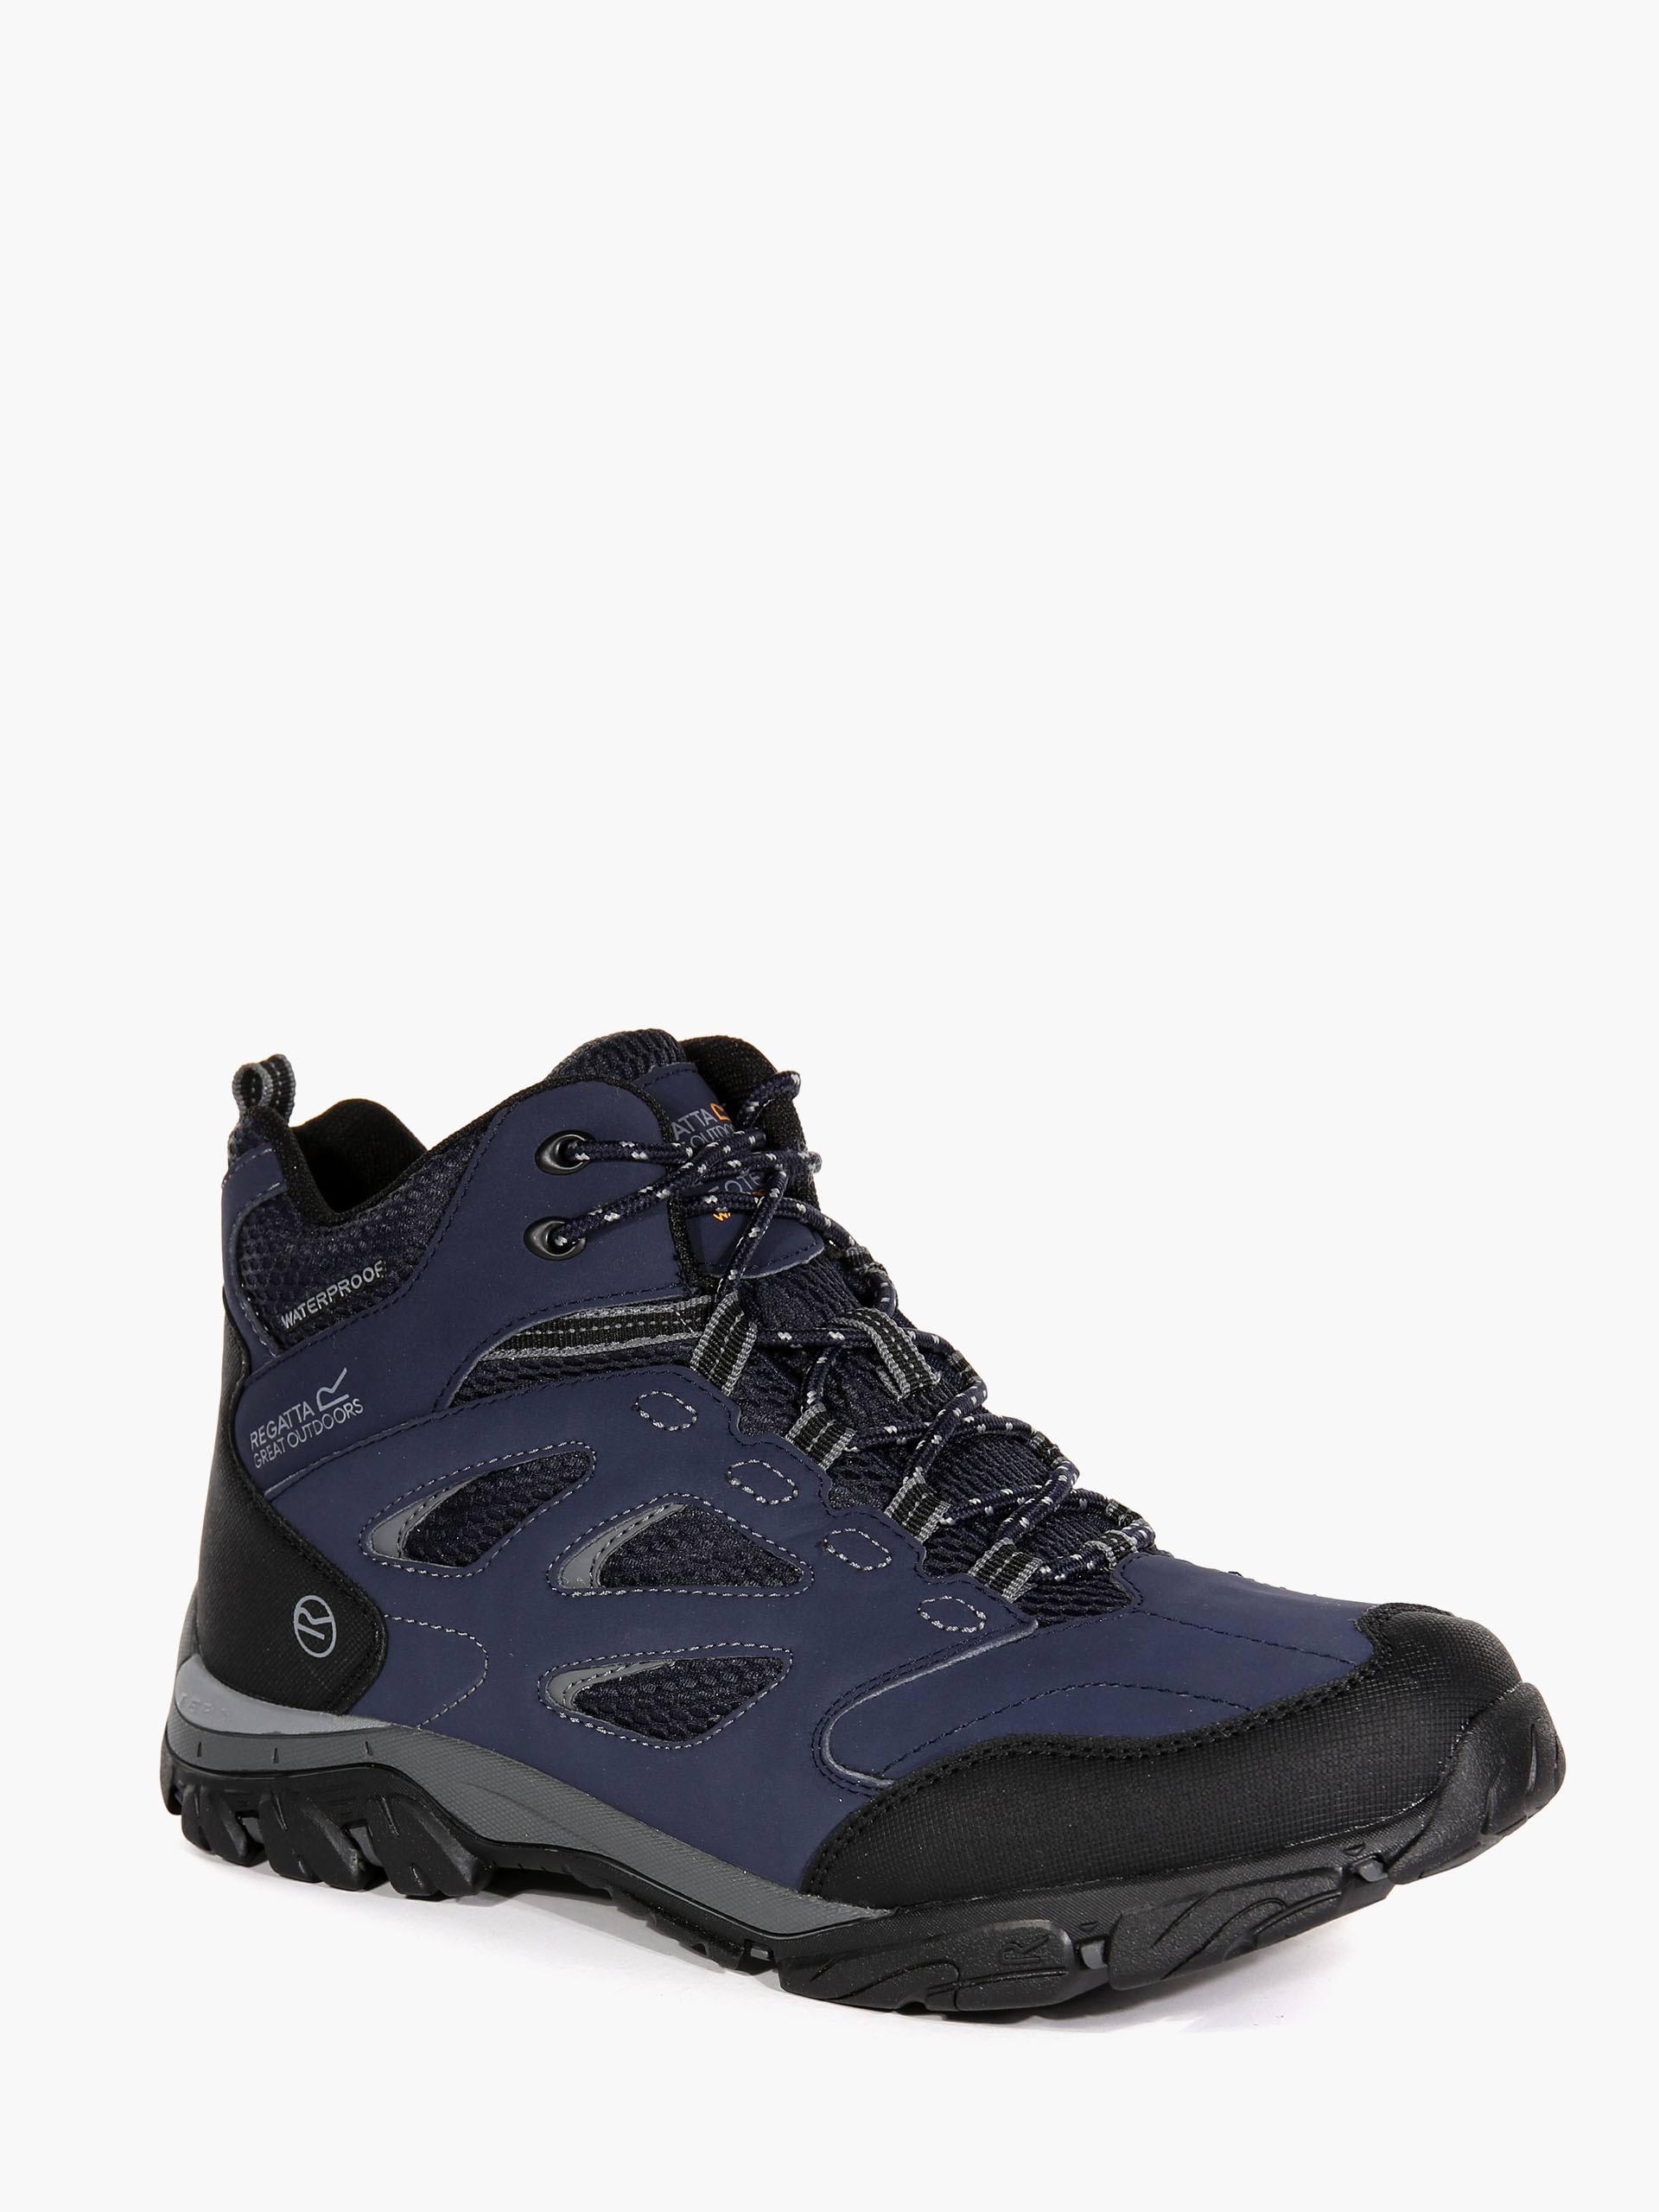 Regatta Holcombe IEP Mid WP Walking Boots - Blue - 10